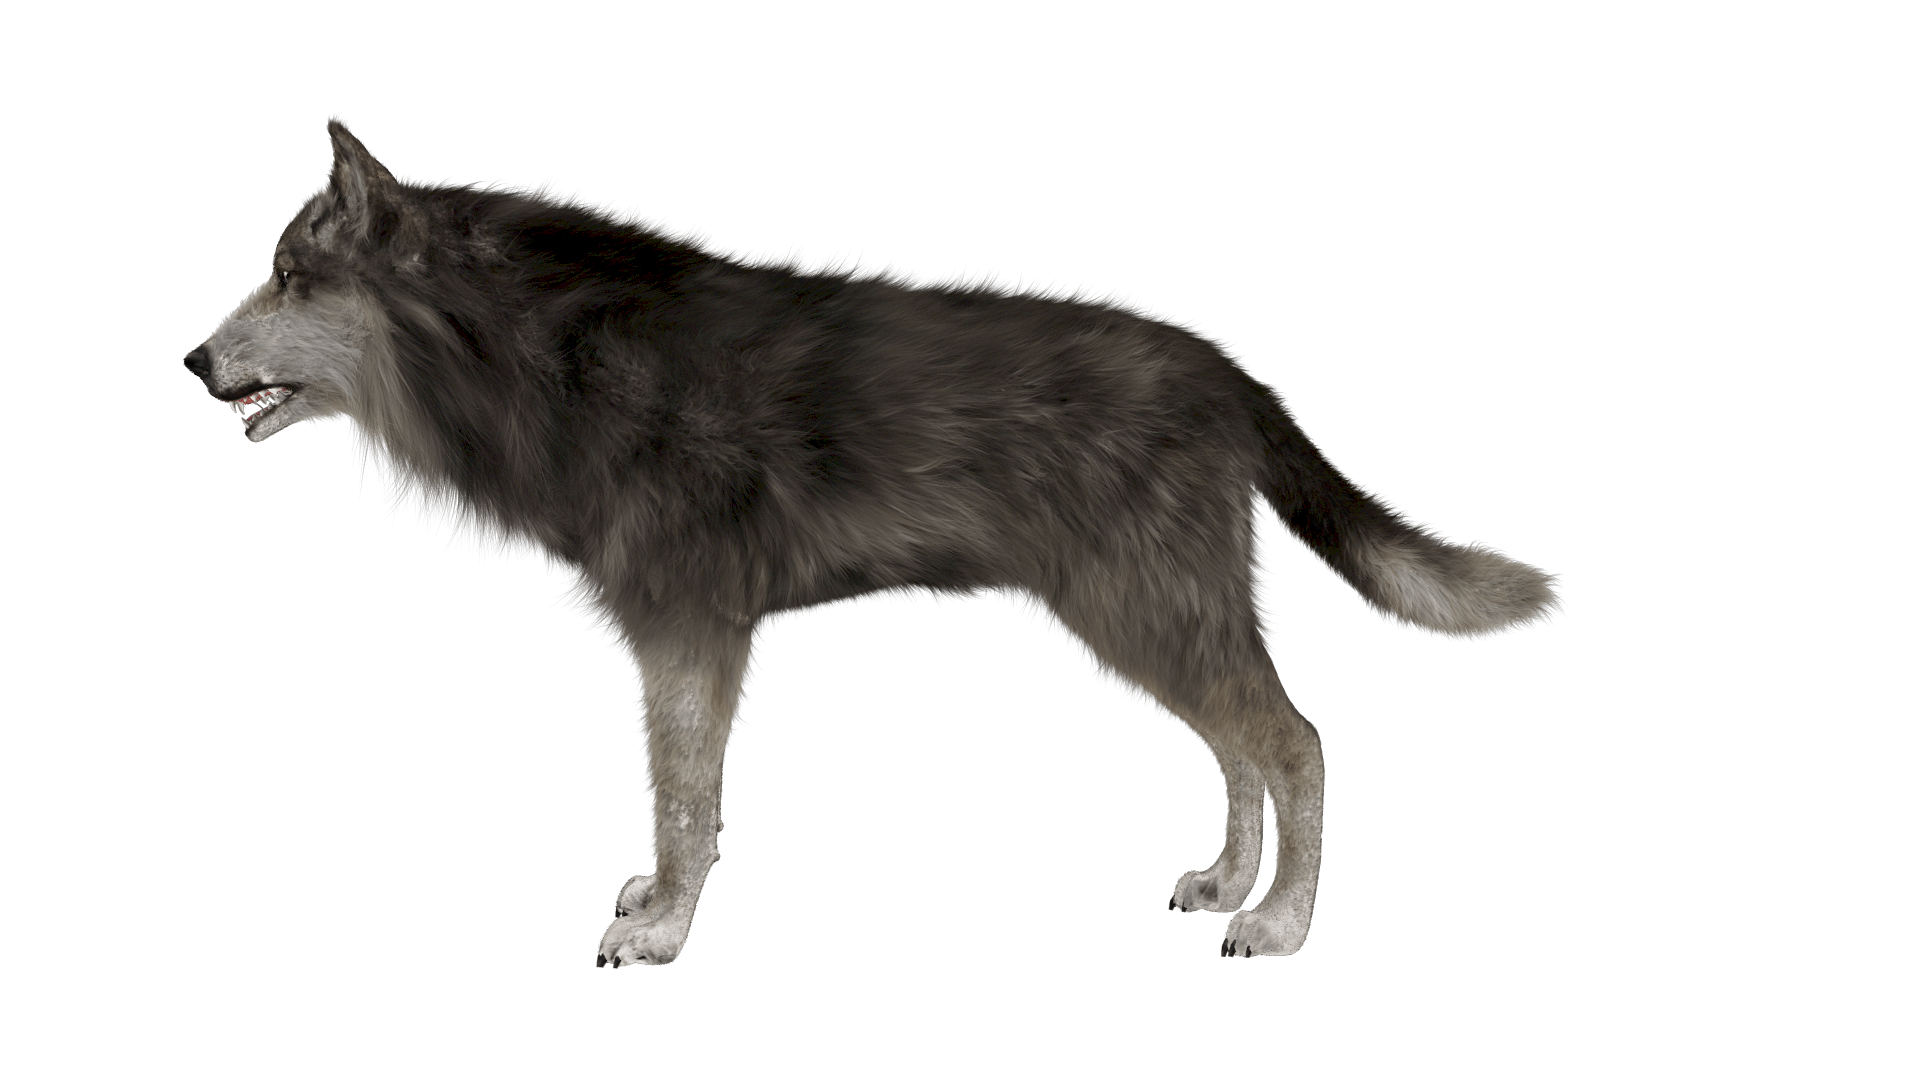 wolf side image_main image PCC2_animal_bust02